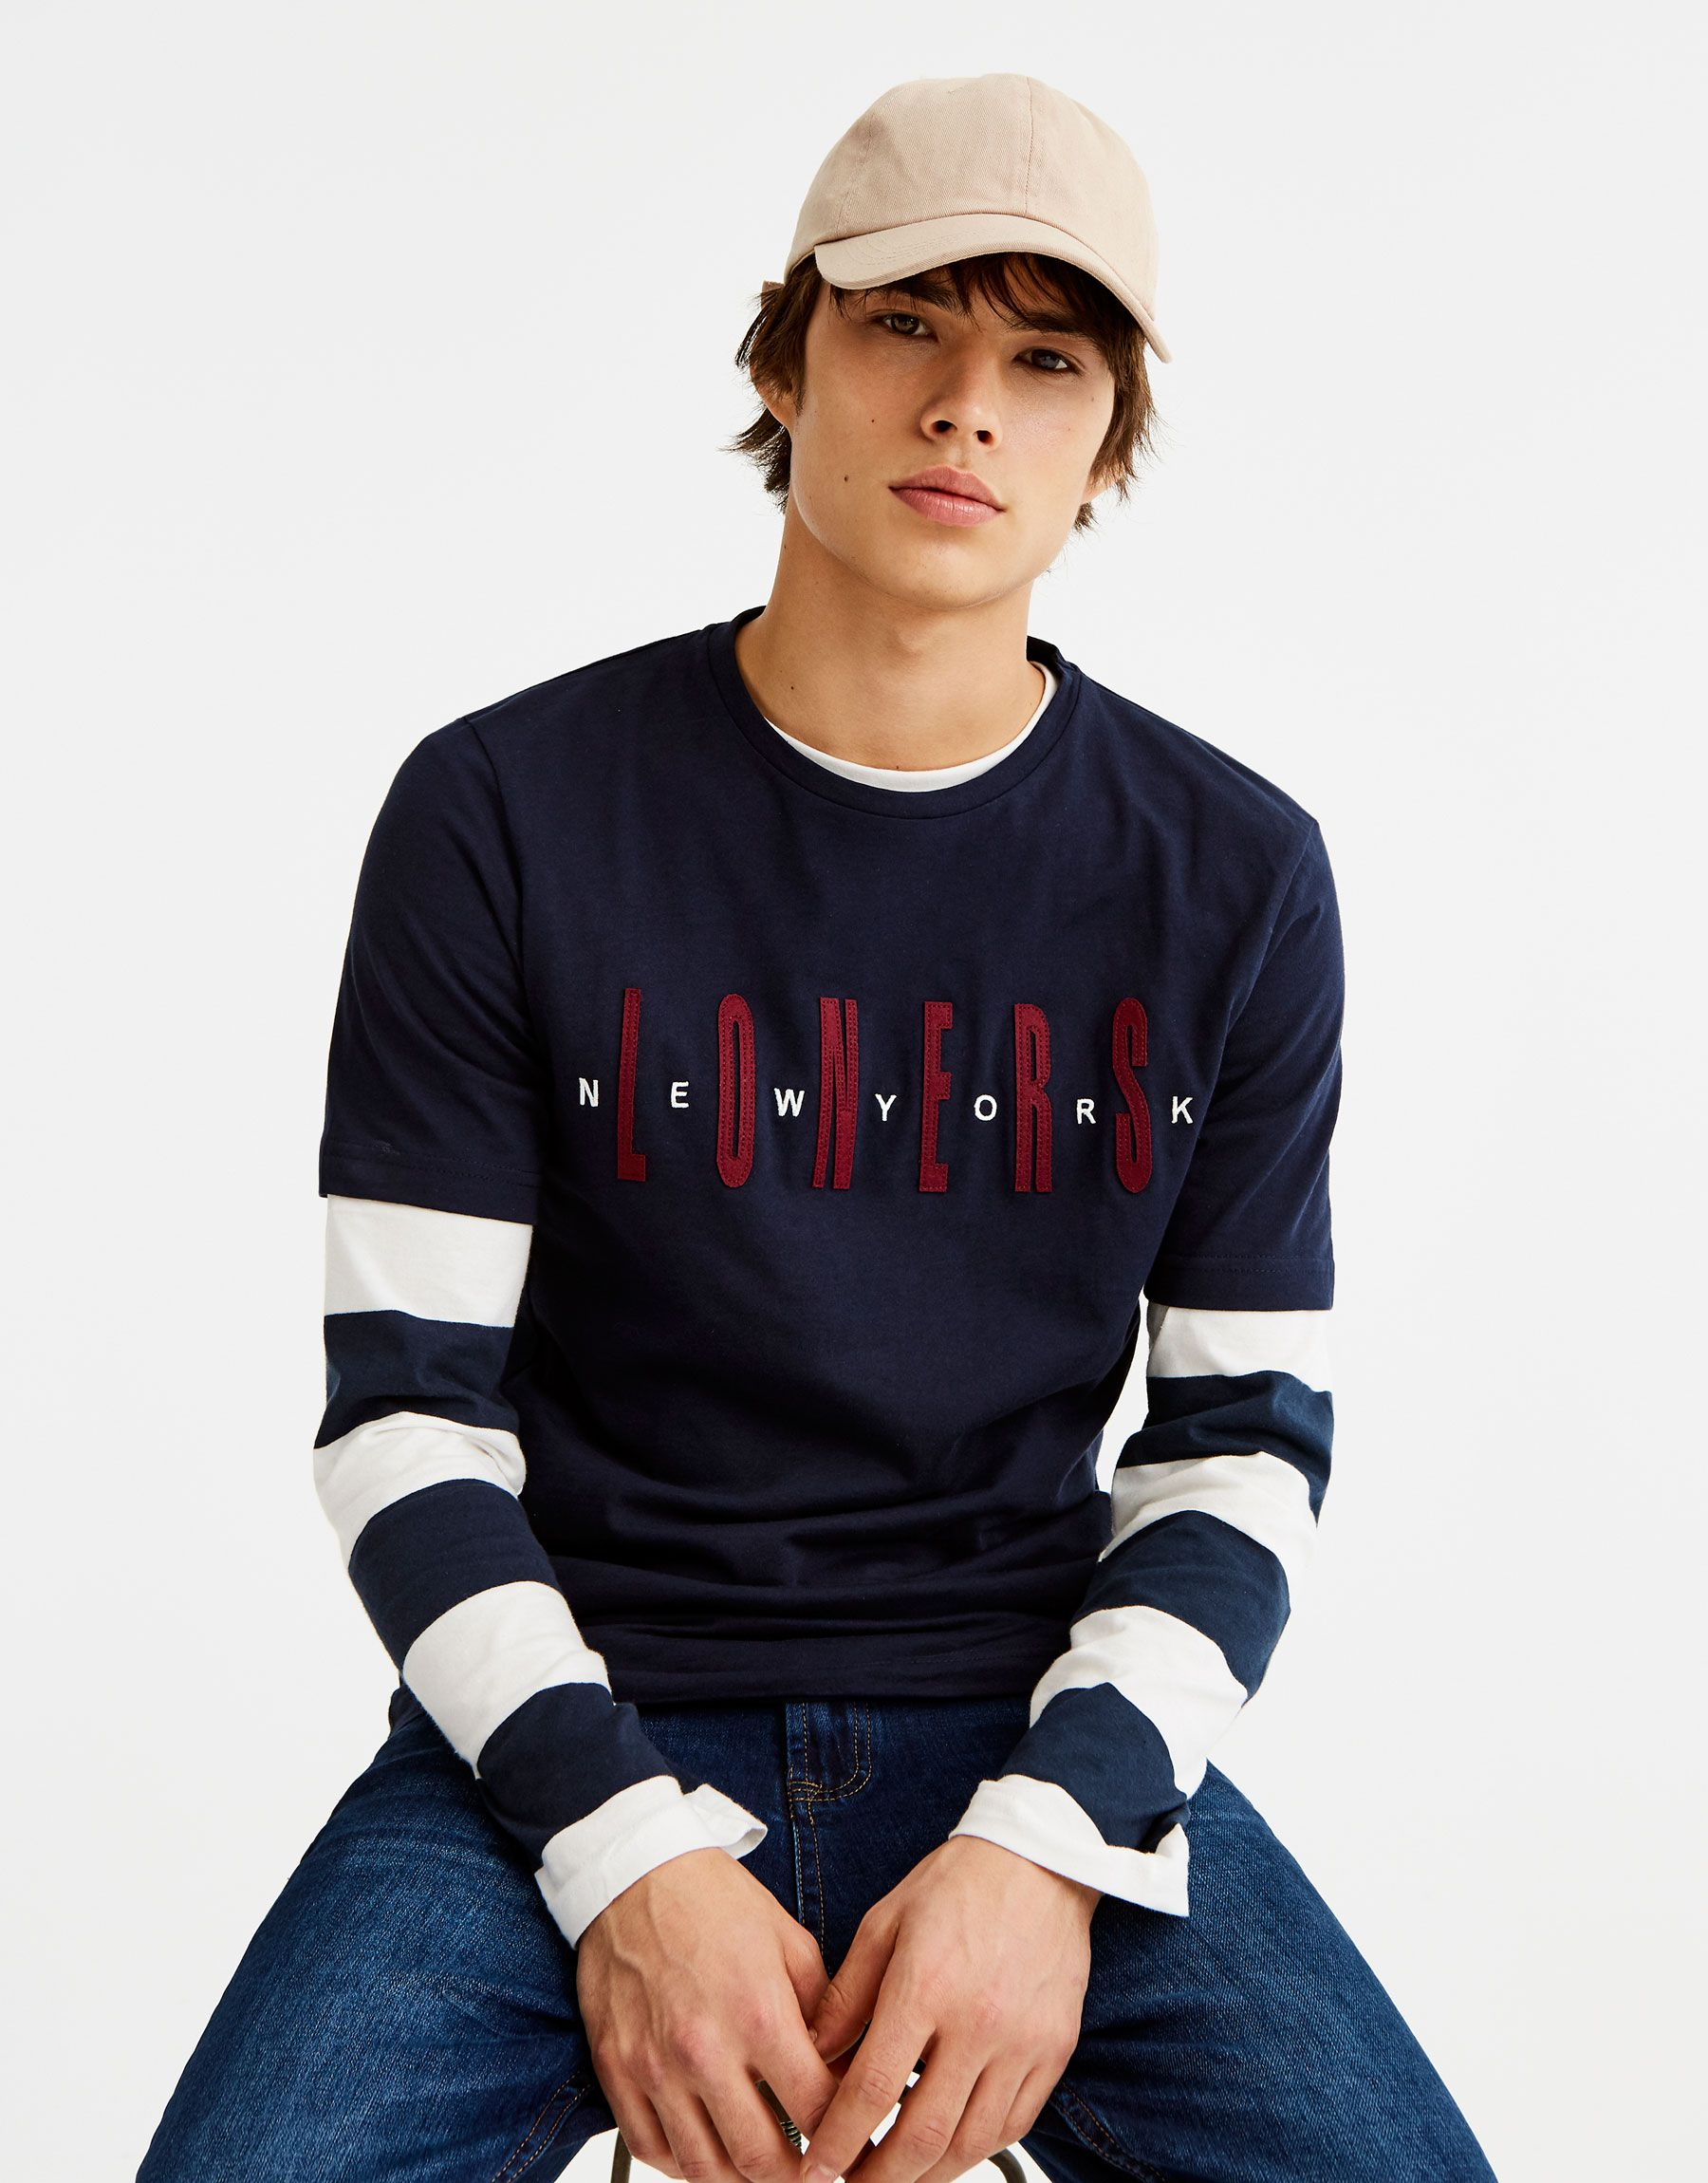 Camiseta Teijdo Sudadera Print Camisetas Ropa Hombre Pull Bear Espana Blue Shirt Men Mens Casual Outfits Mens Sweatshirts